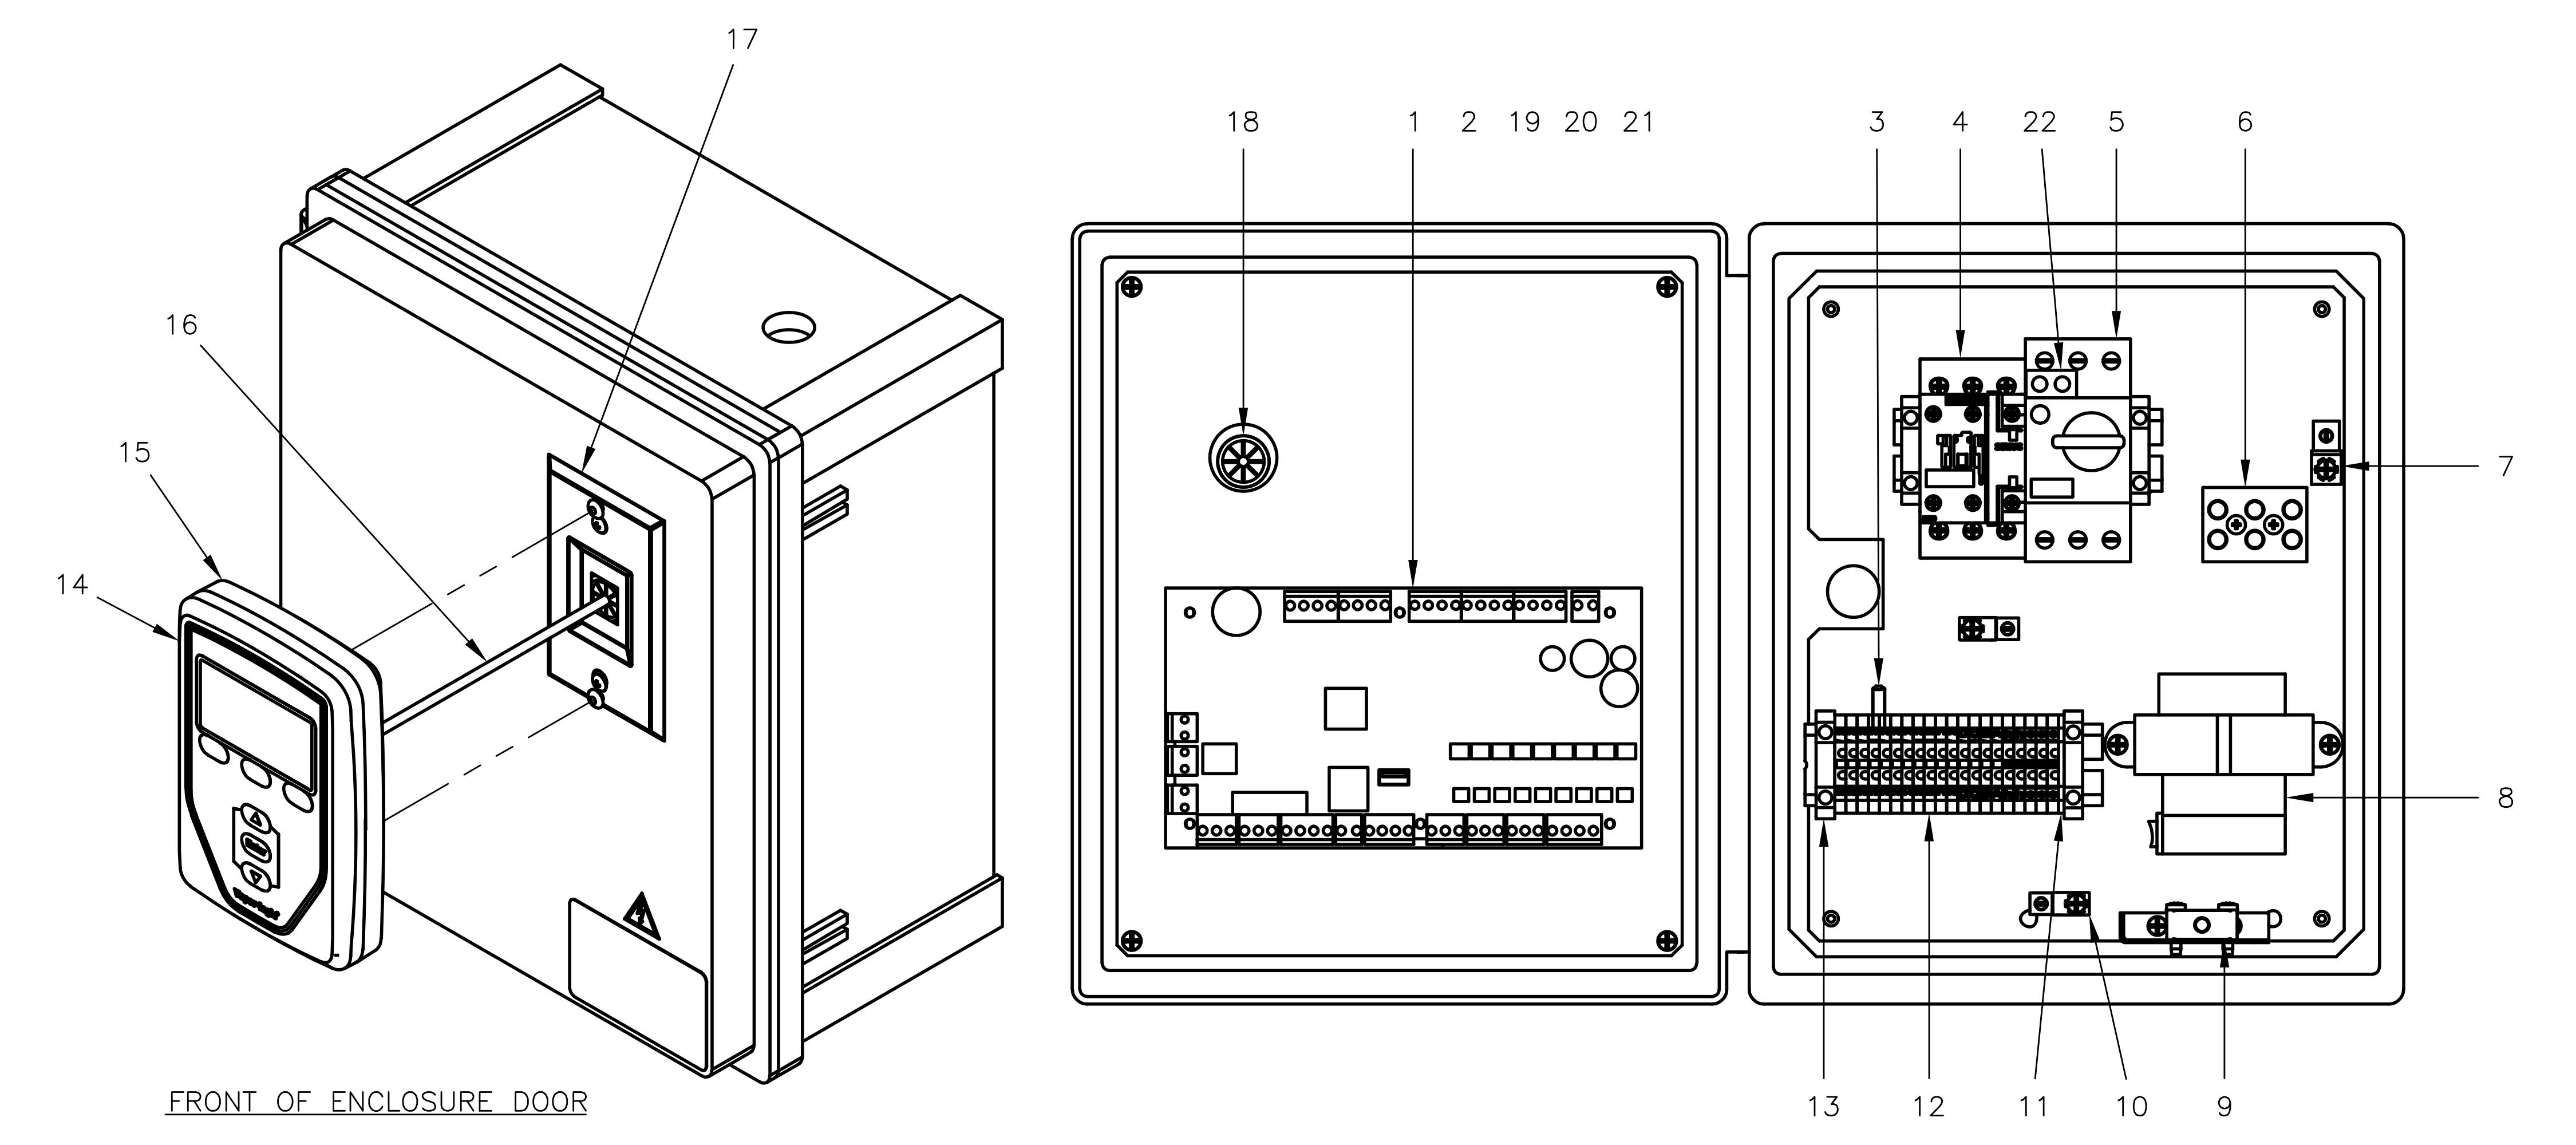 Control Cabinet Parts